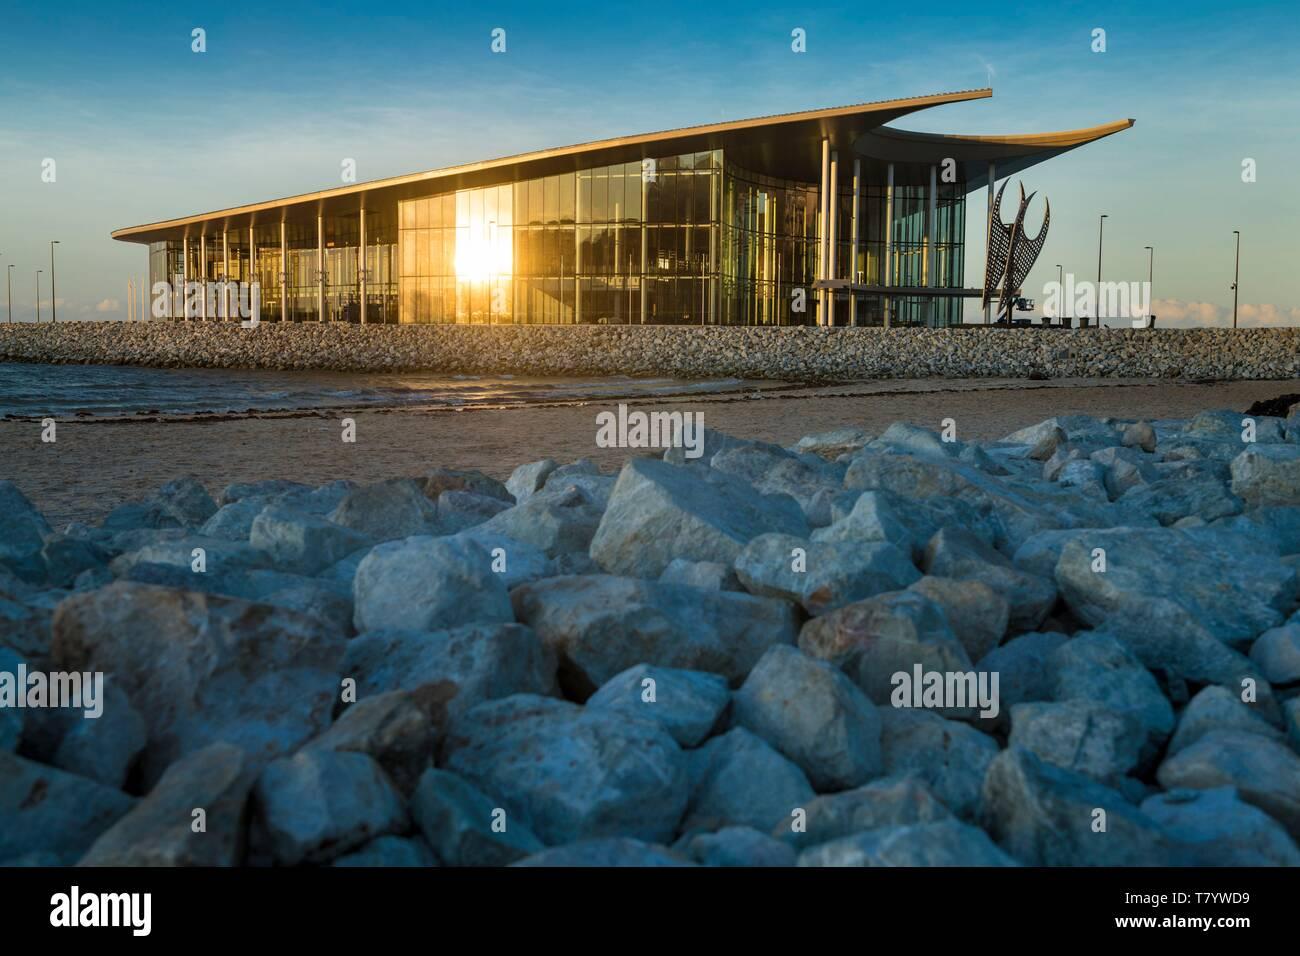 - Papua-New Guinea Papua Bay, National Capital District, Port Moresby Stadt, Ela Beach, Apec Haus Gebäude wie ein Lakatoi Segel Stockbild